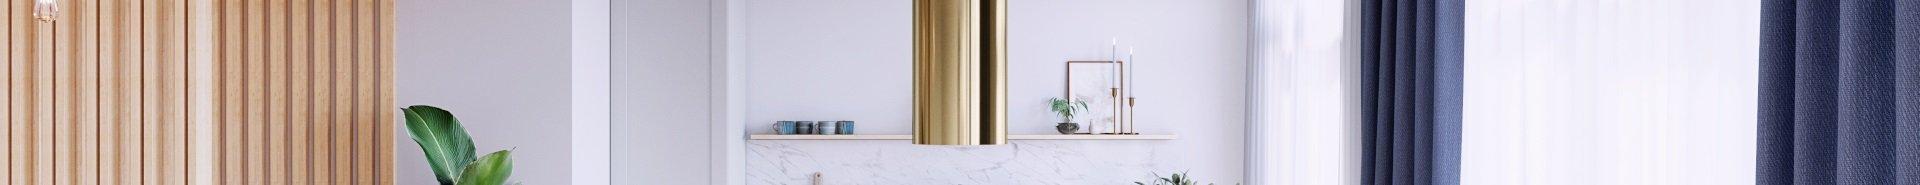 Asterio Isola 39.1 Light gold